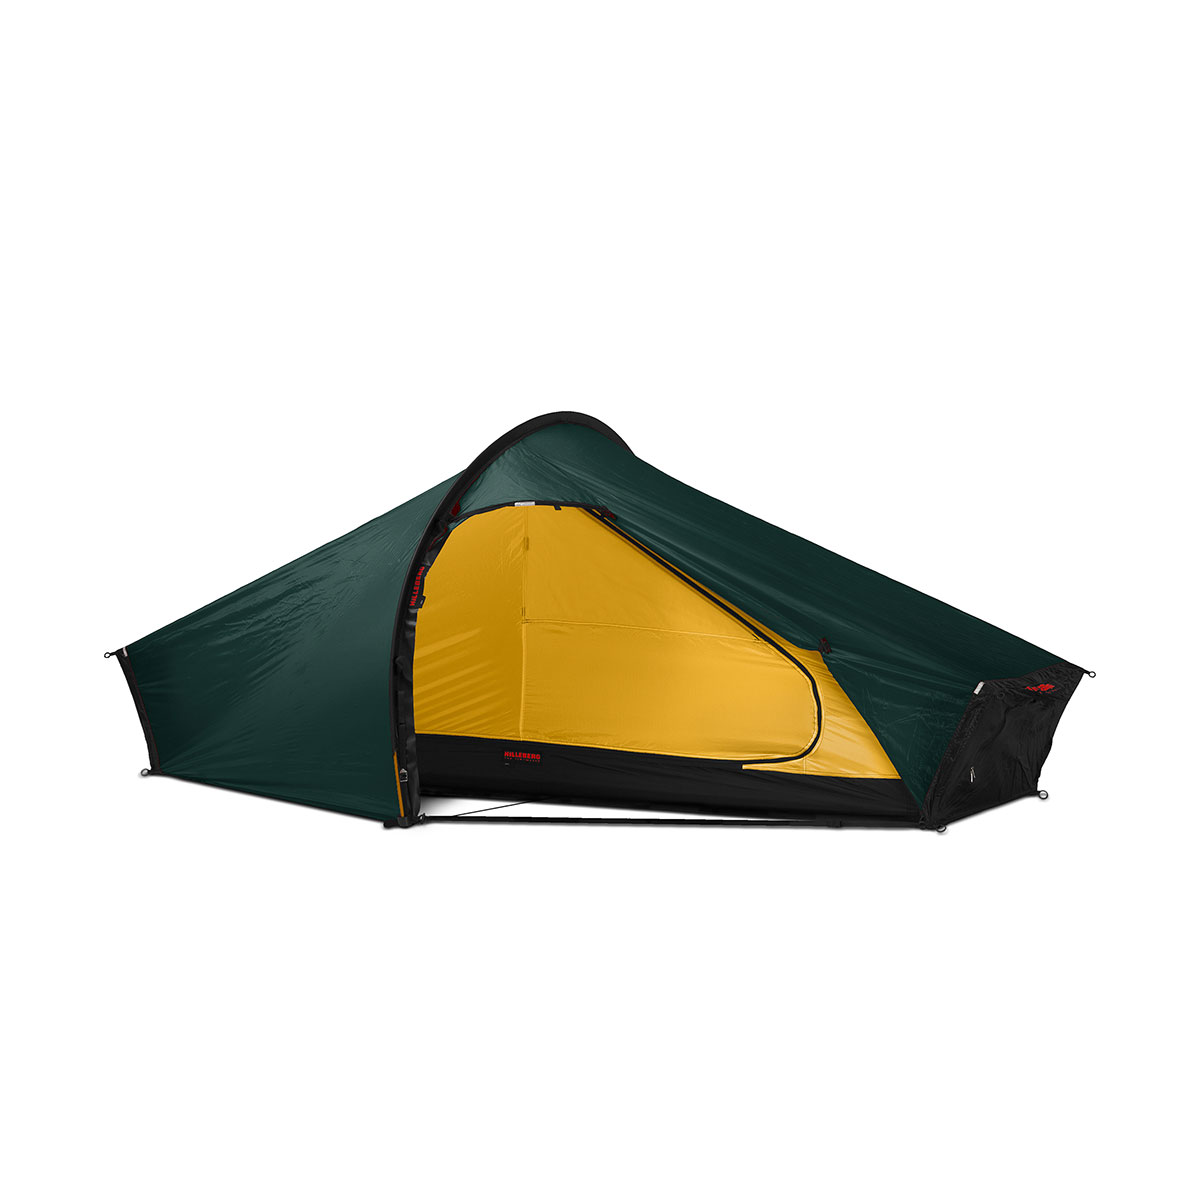 Akto tent  sc 1 st  Moontrail & Hilleberg Akto tent (free ground shipping) :: 4-season tunnel ...